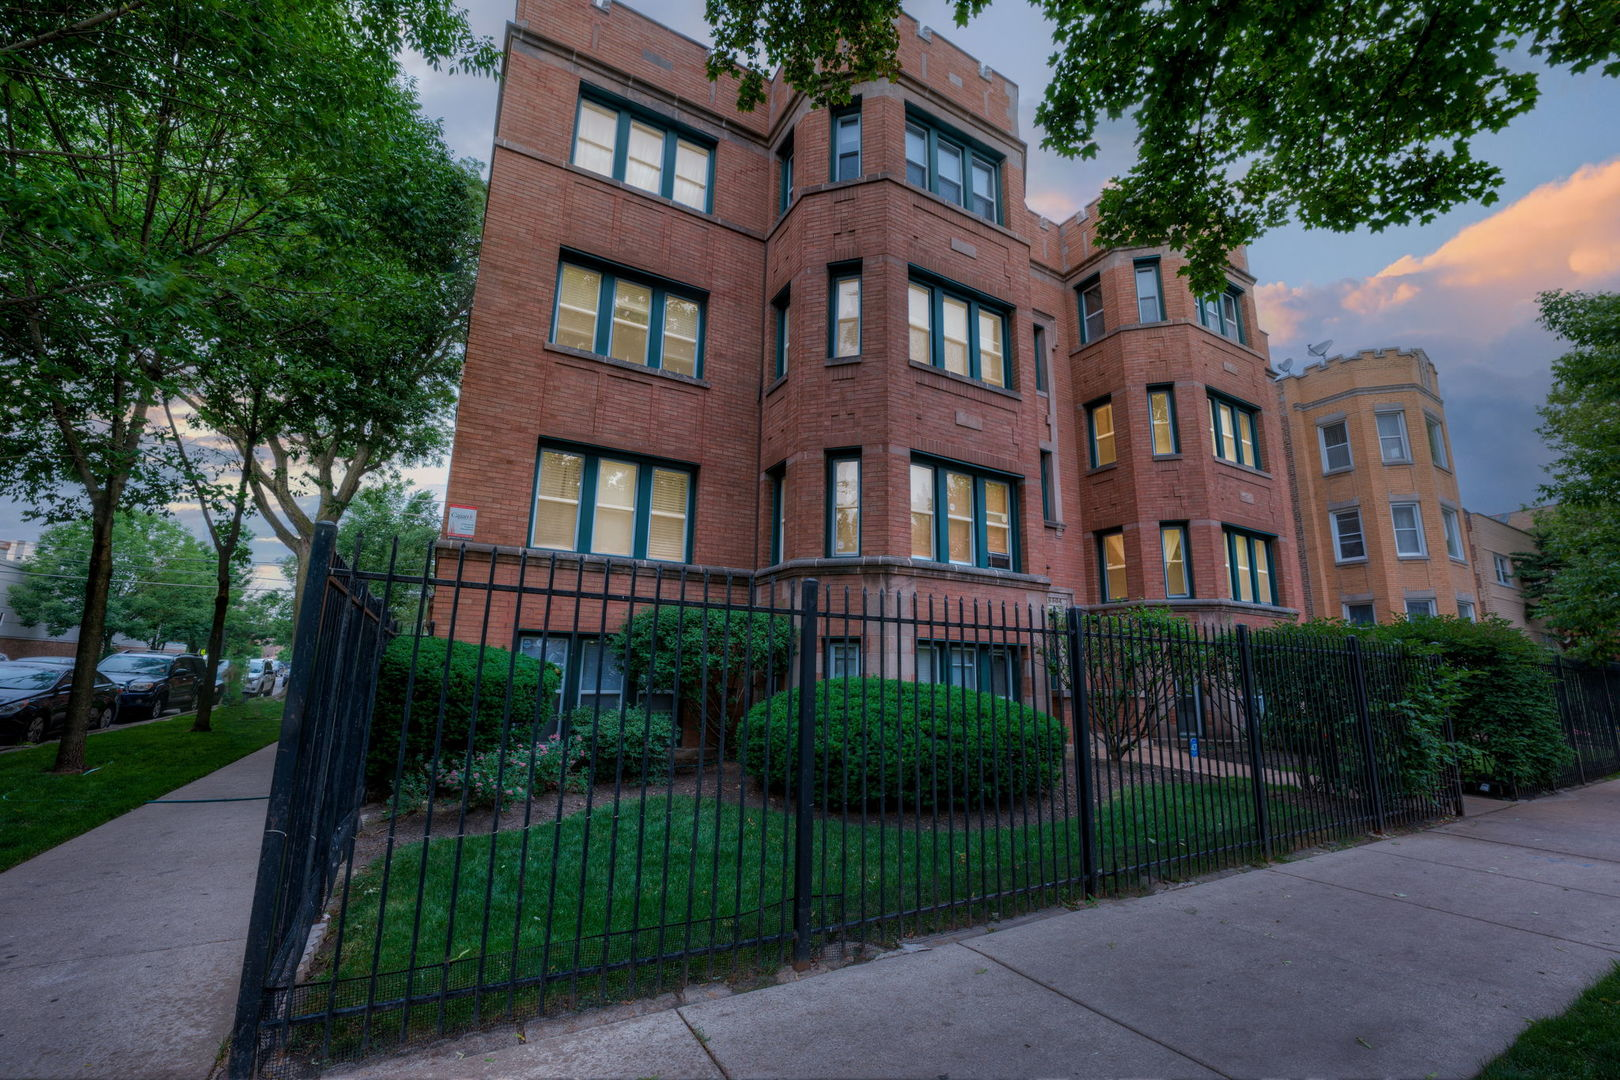 2332 Rosemont Unit Unit 1 ,Chicago, Illinois 60659